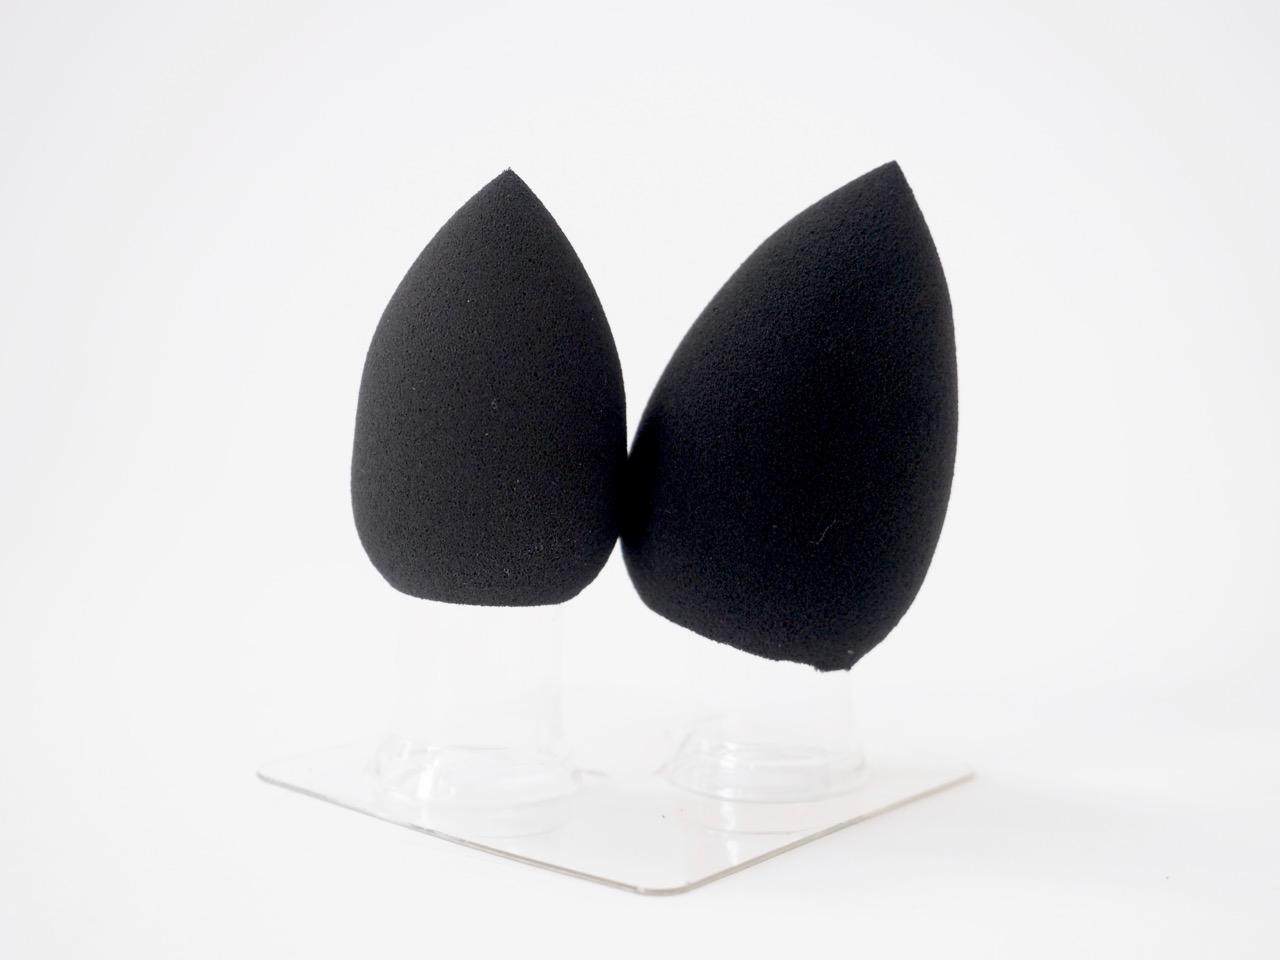 sephora precision blending sponges sormimeikkisieni kokoemuksia ostolakossa virve vee